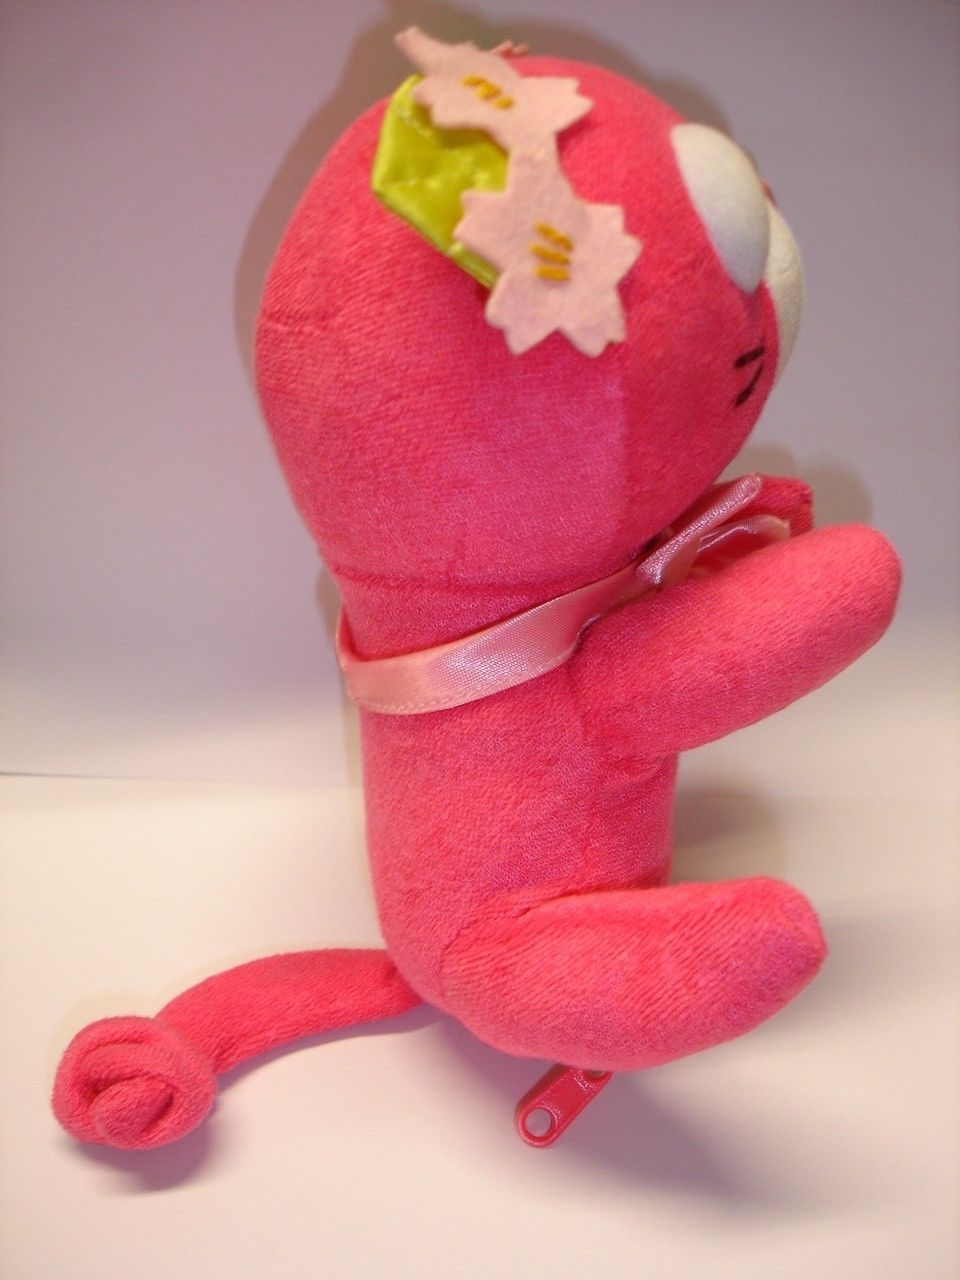 "Sega toys Horipro Ocha-Ken tea puppy Sakura 7.5"" cat plush stuffed doll figure image 2"